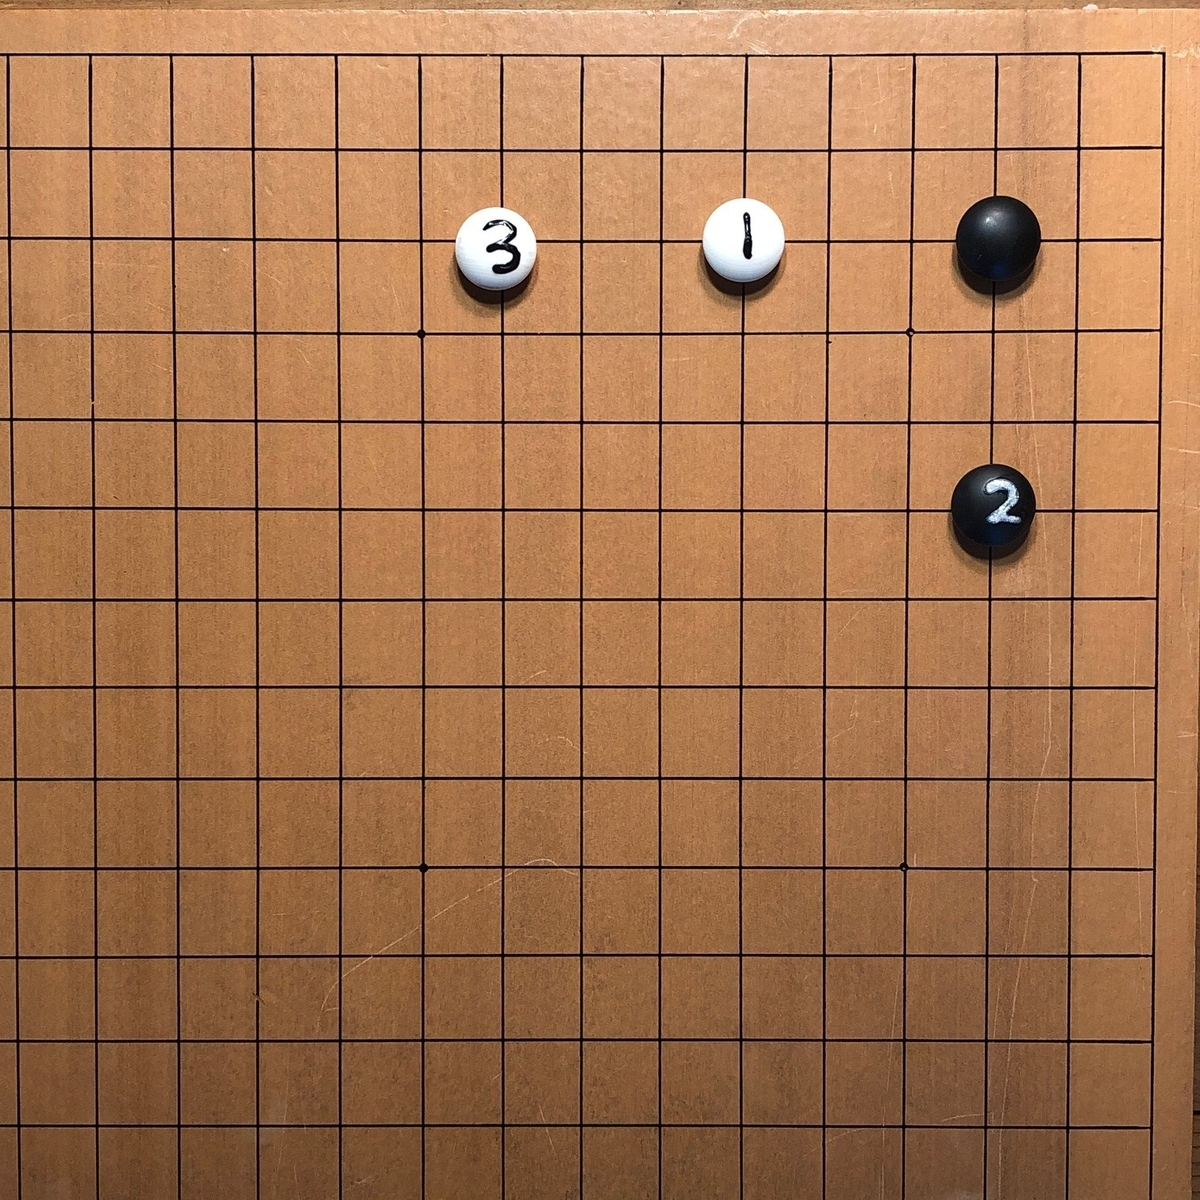 f:id:ryu-igo:20200325105227j:plain